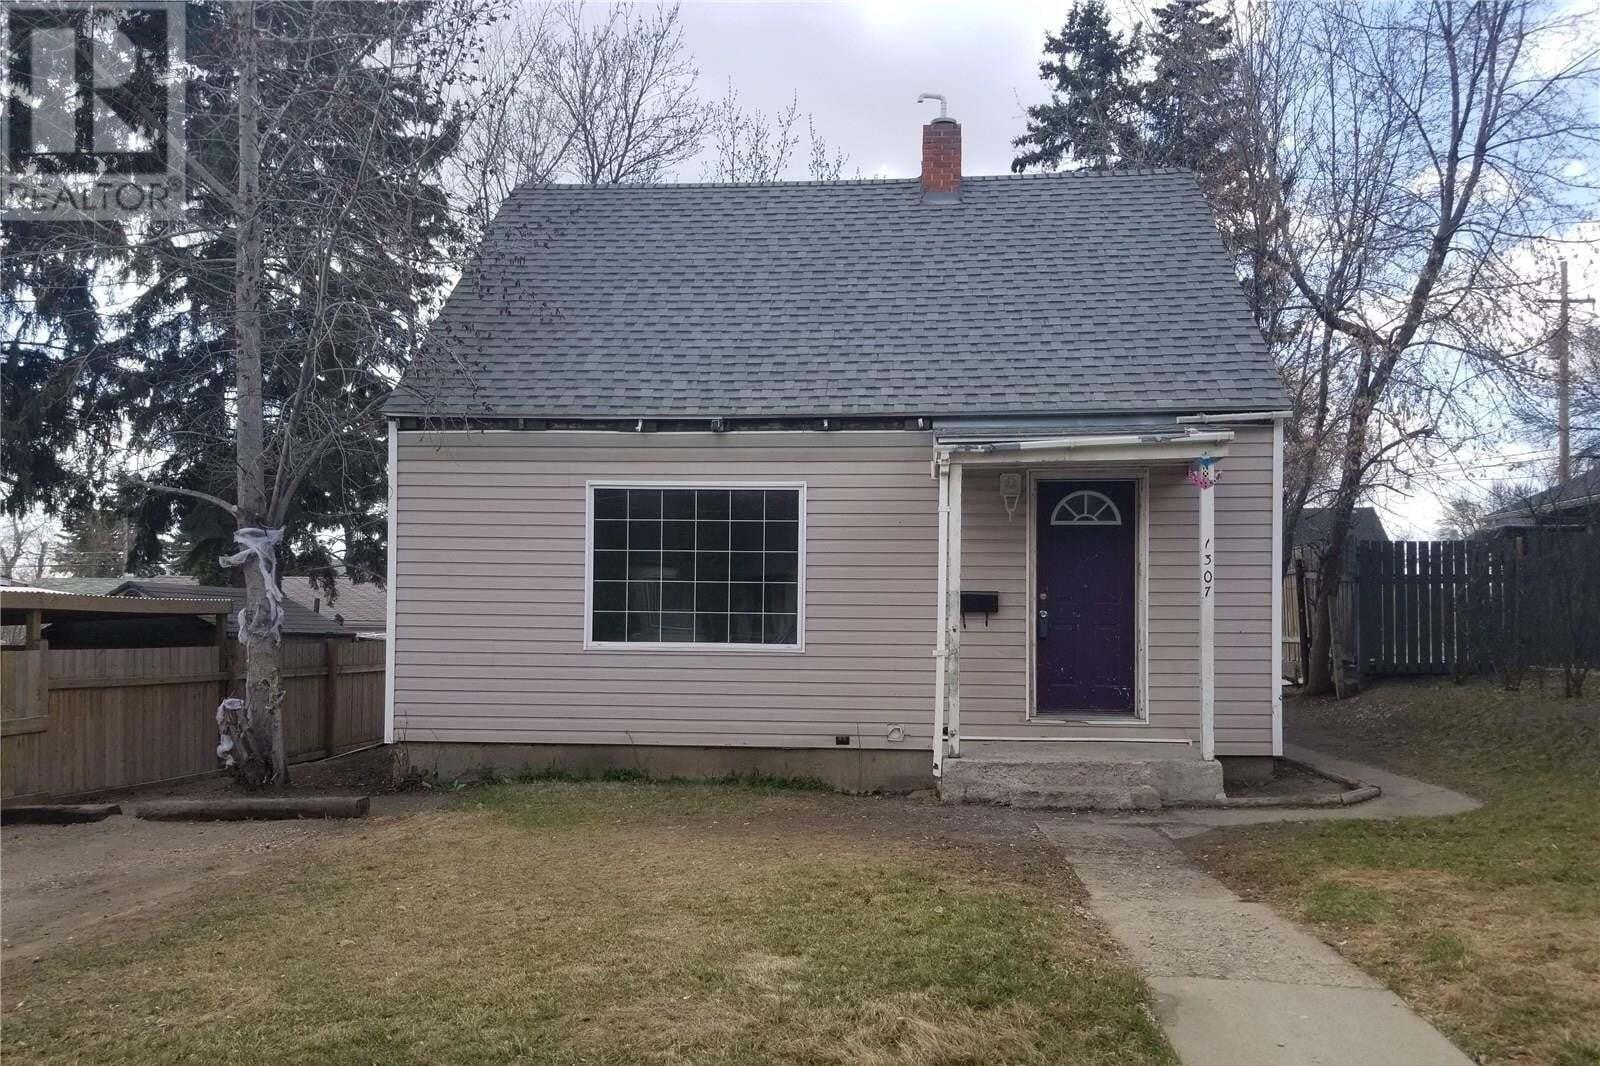 House for sale at 1307 2nd Ave N Saskatoon Saskatchewan - MLS: SK827196